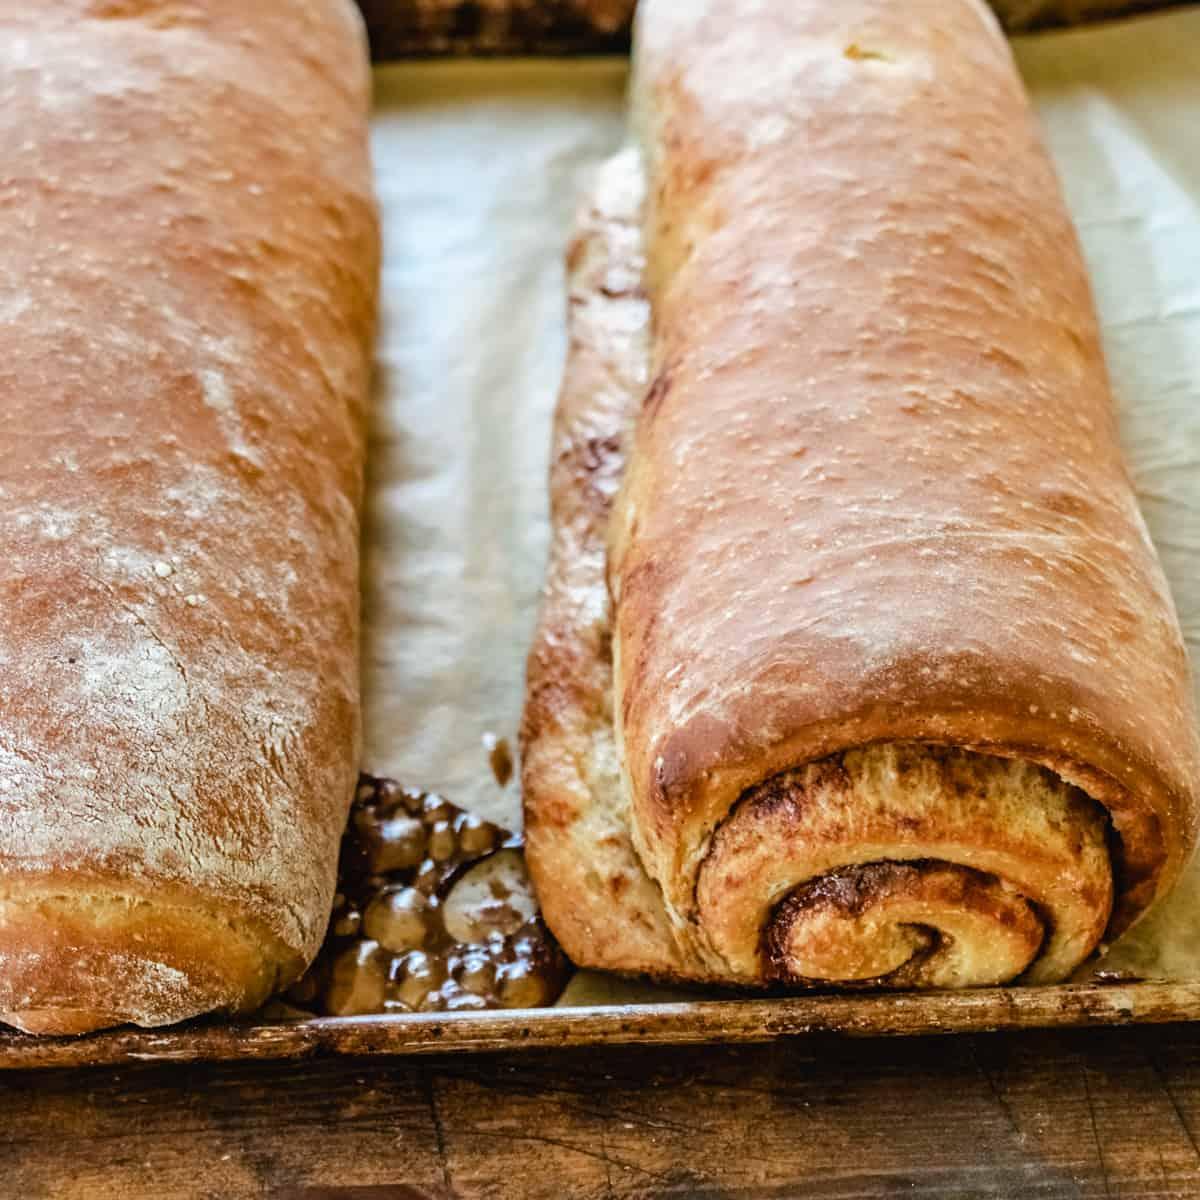 Two loaves of cinnamon bread swirled with cinnamon.